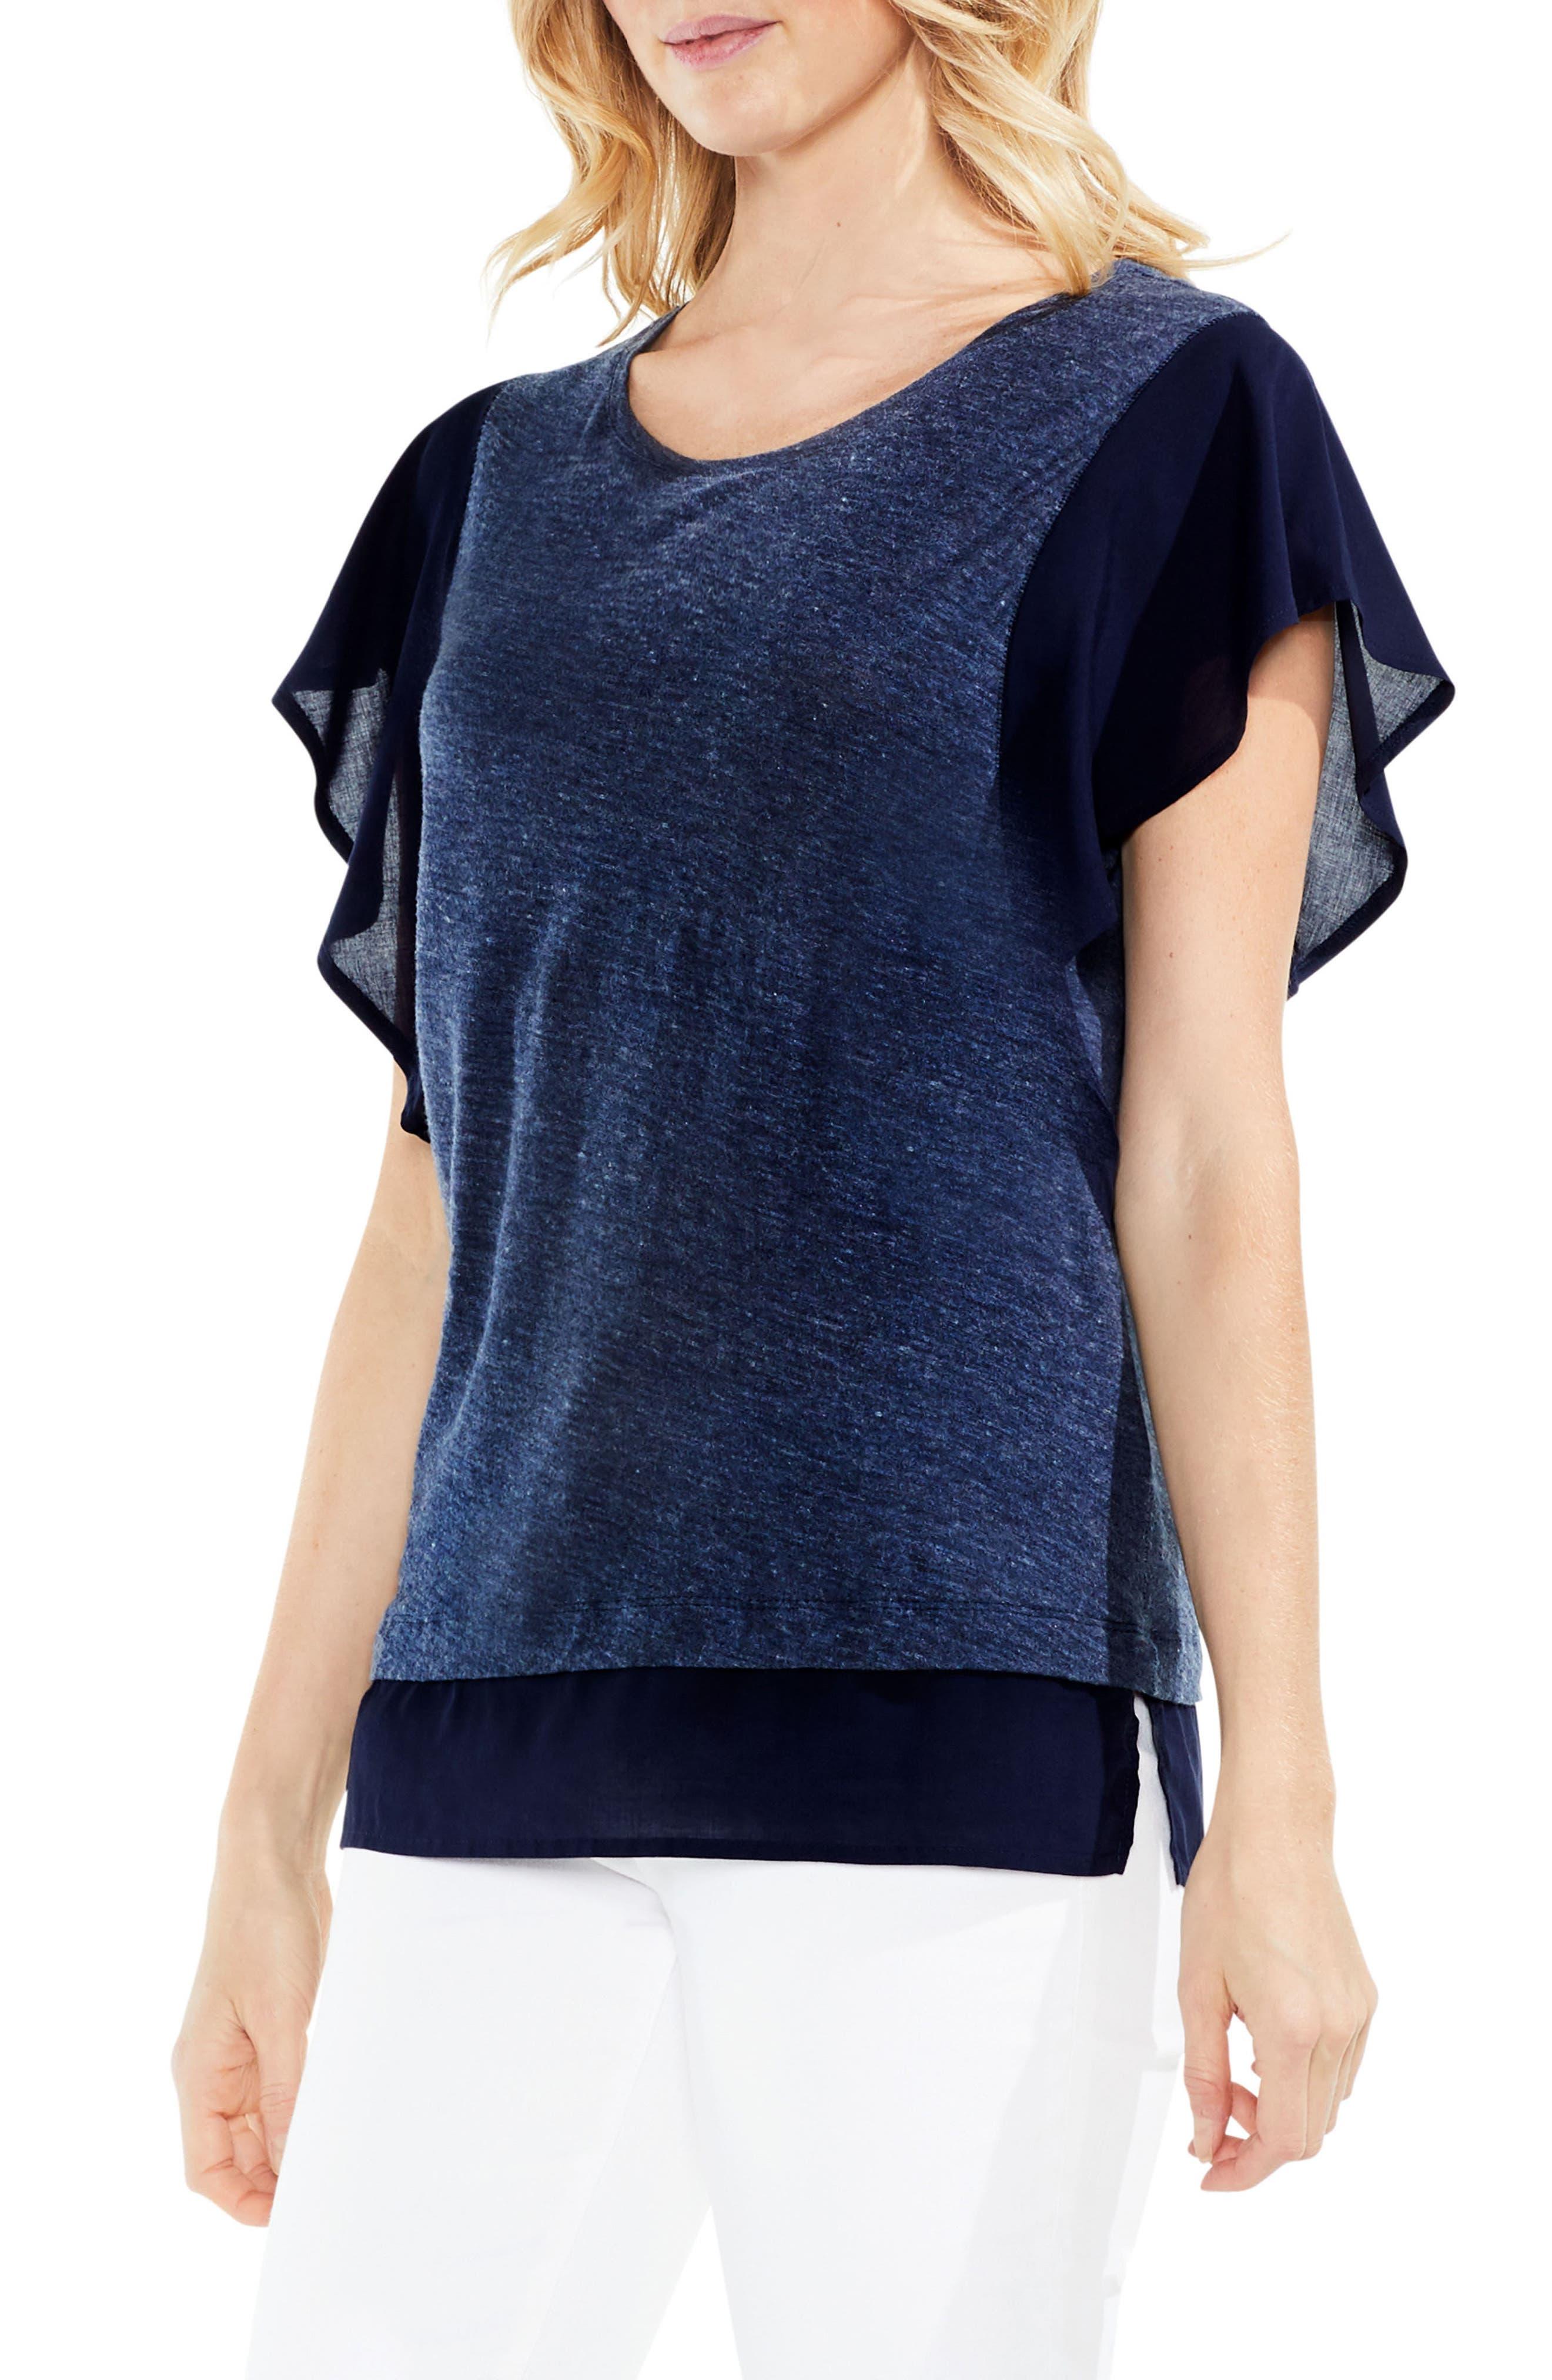 Ruffle Sleeve Top,                         Main,                         color, Indigo Night Heather